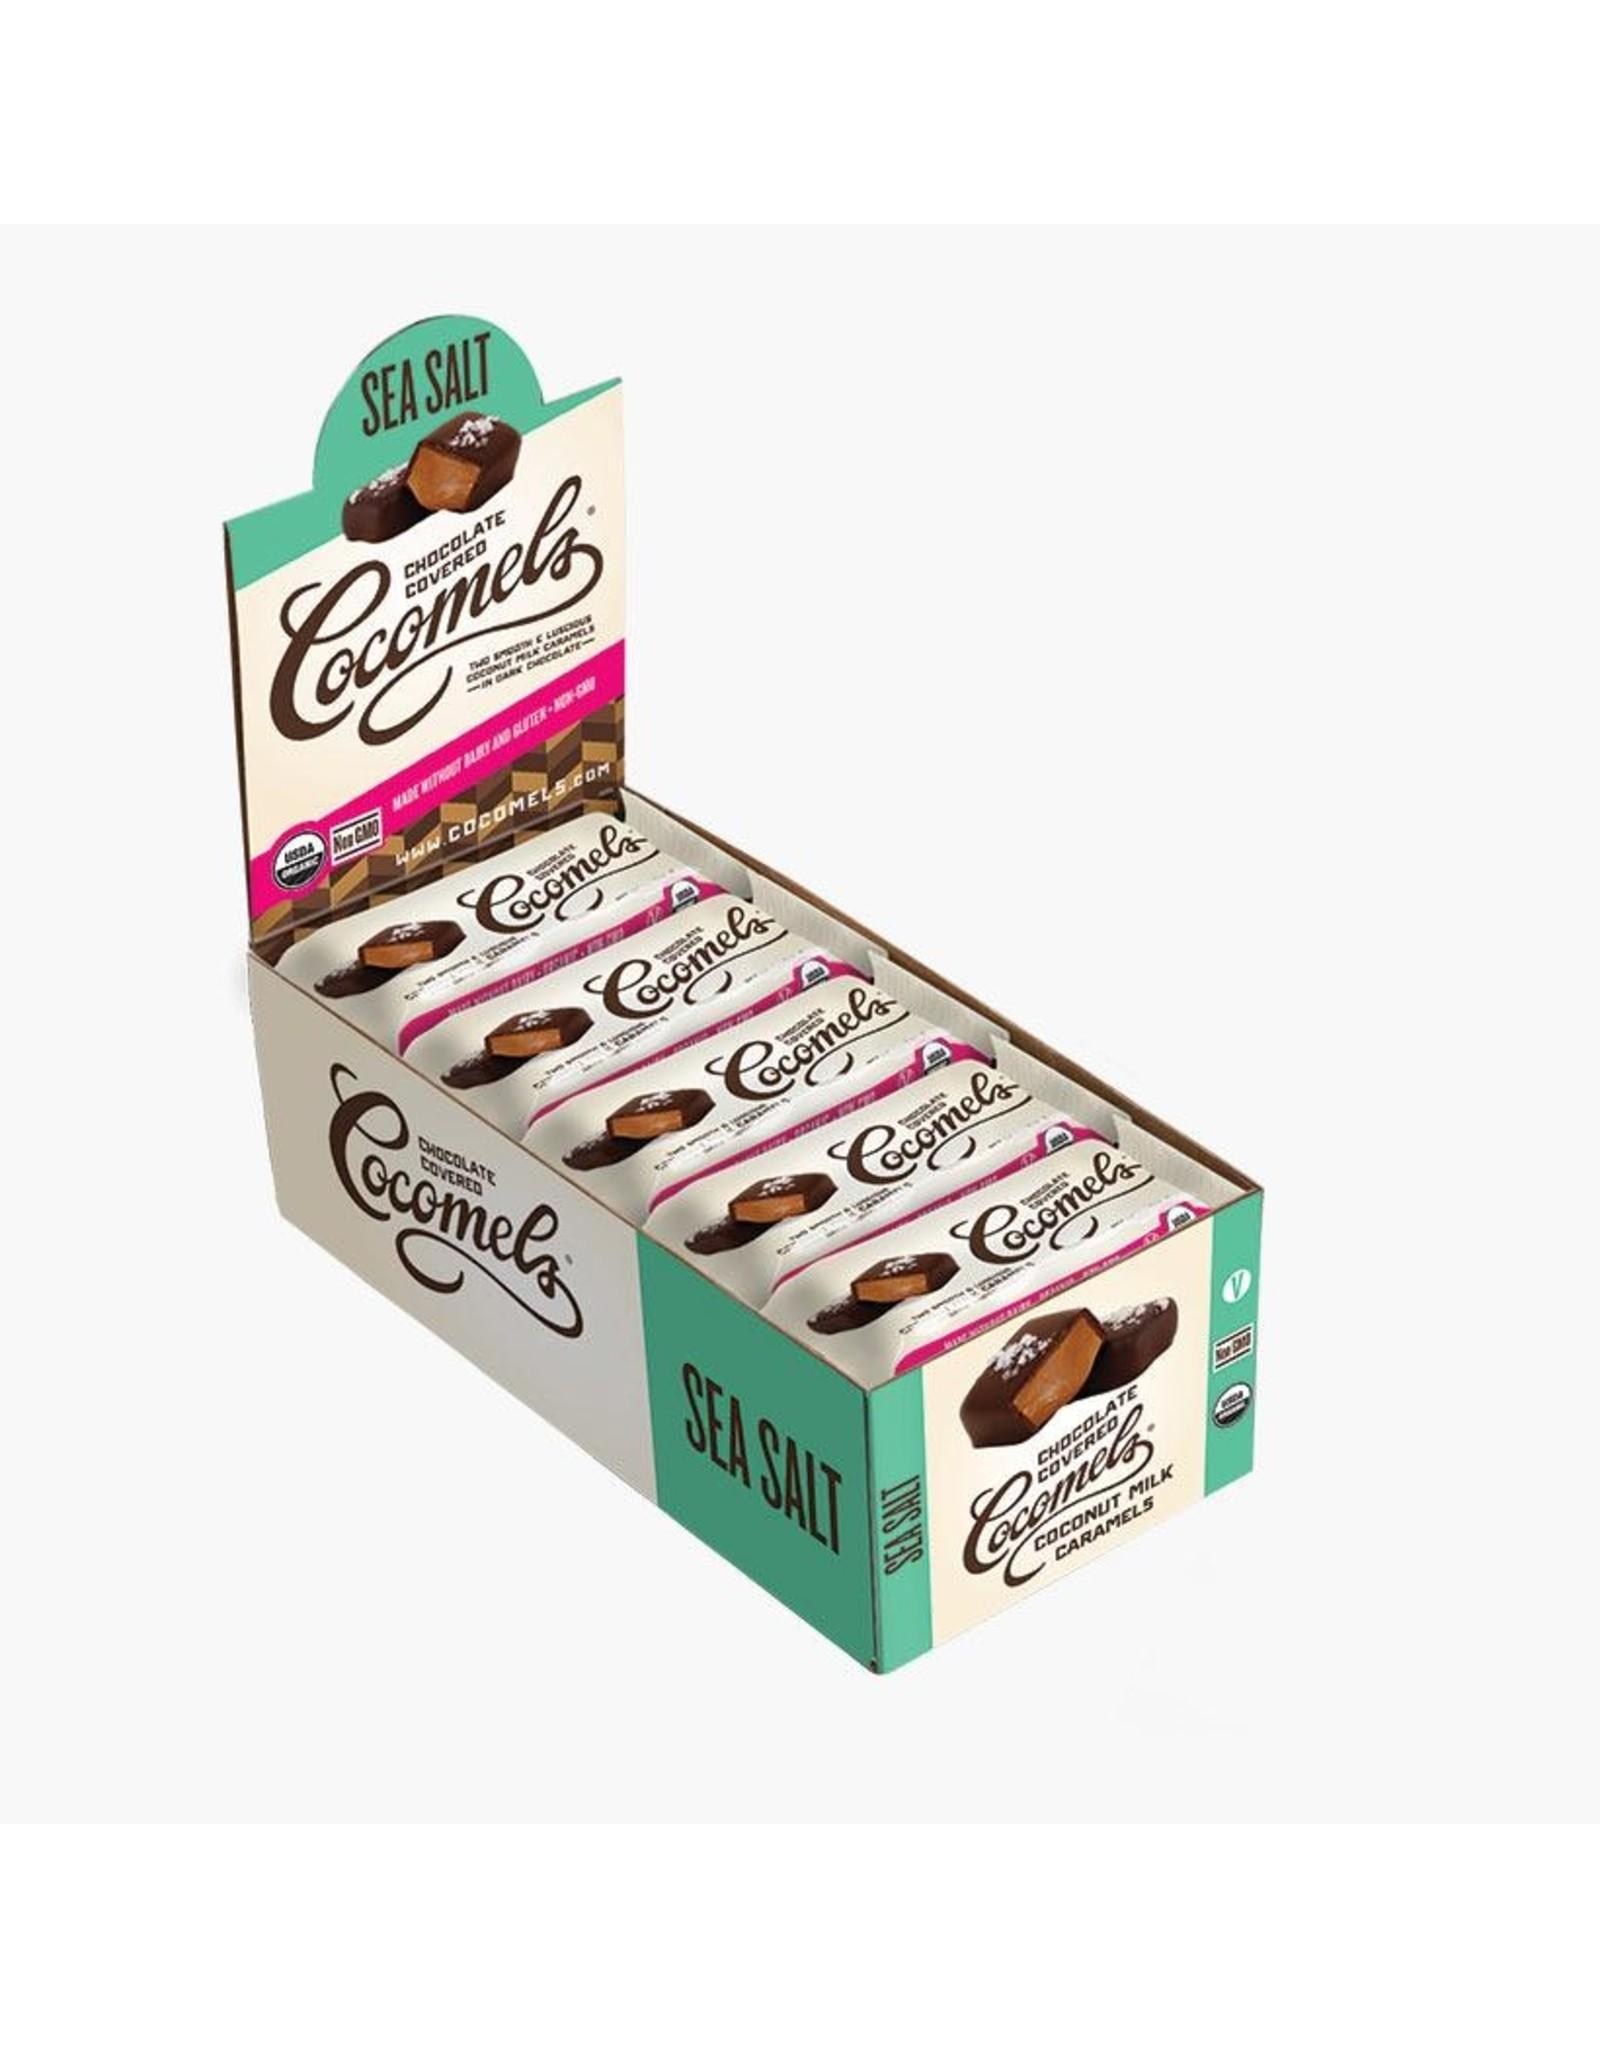 Cocomel Cocomel Chocolate Covered Coconut Milk Caramel 2-Pack (Sea Salt)